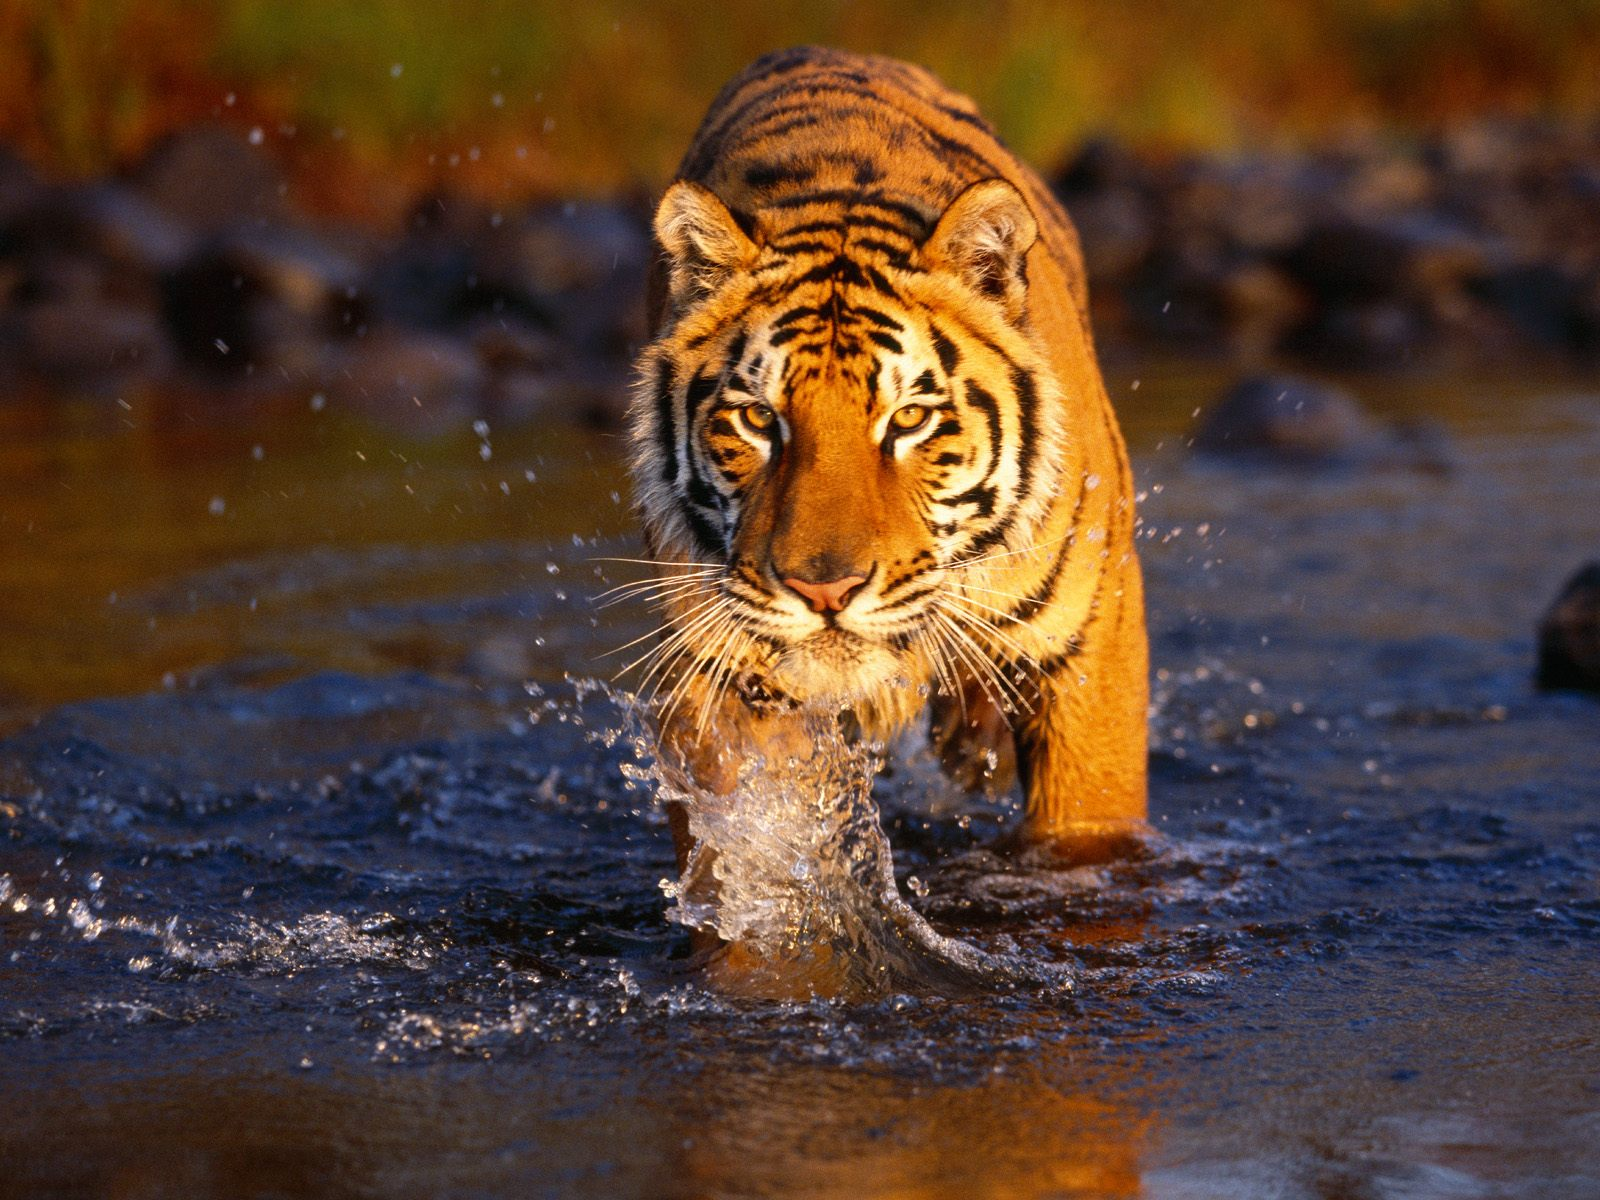 Japan: Tigers HD Wallpapers, Tiger Wallpaper for Desktop Backgrounds Free